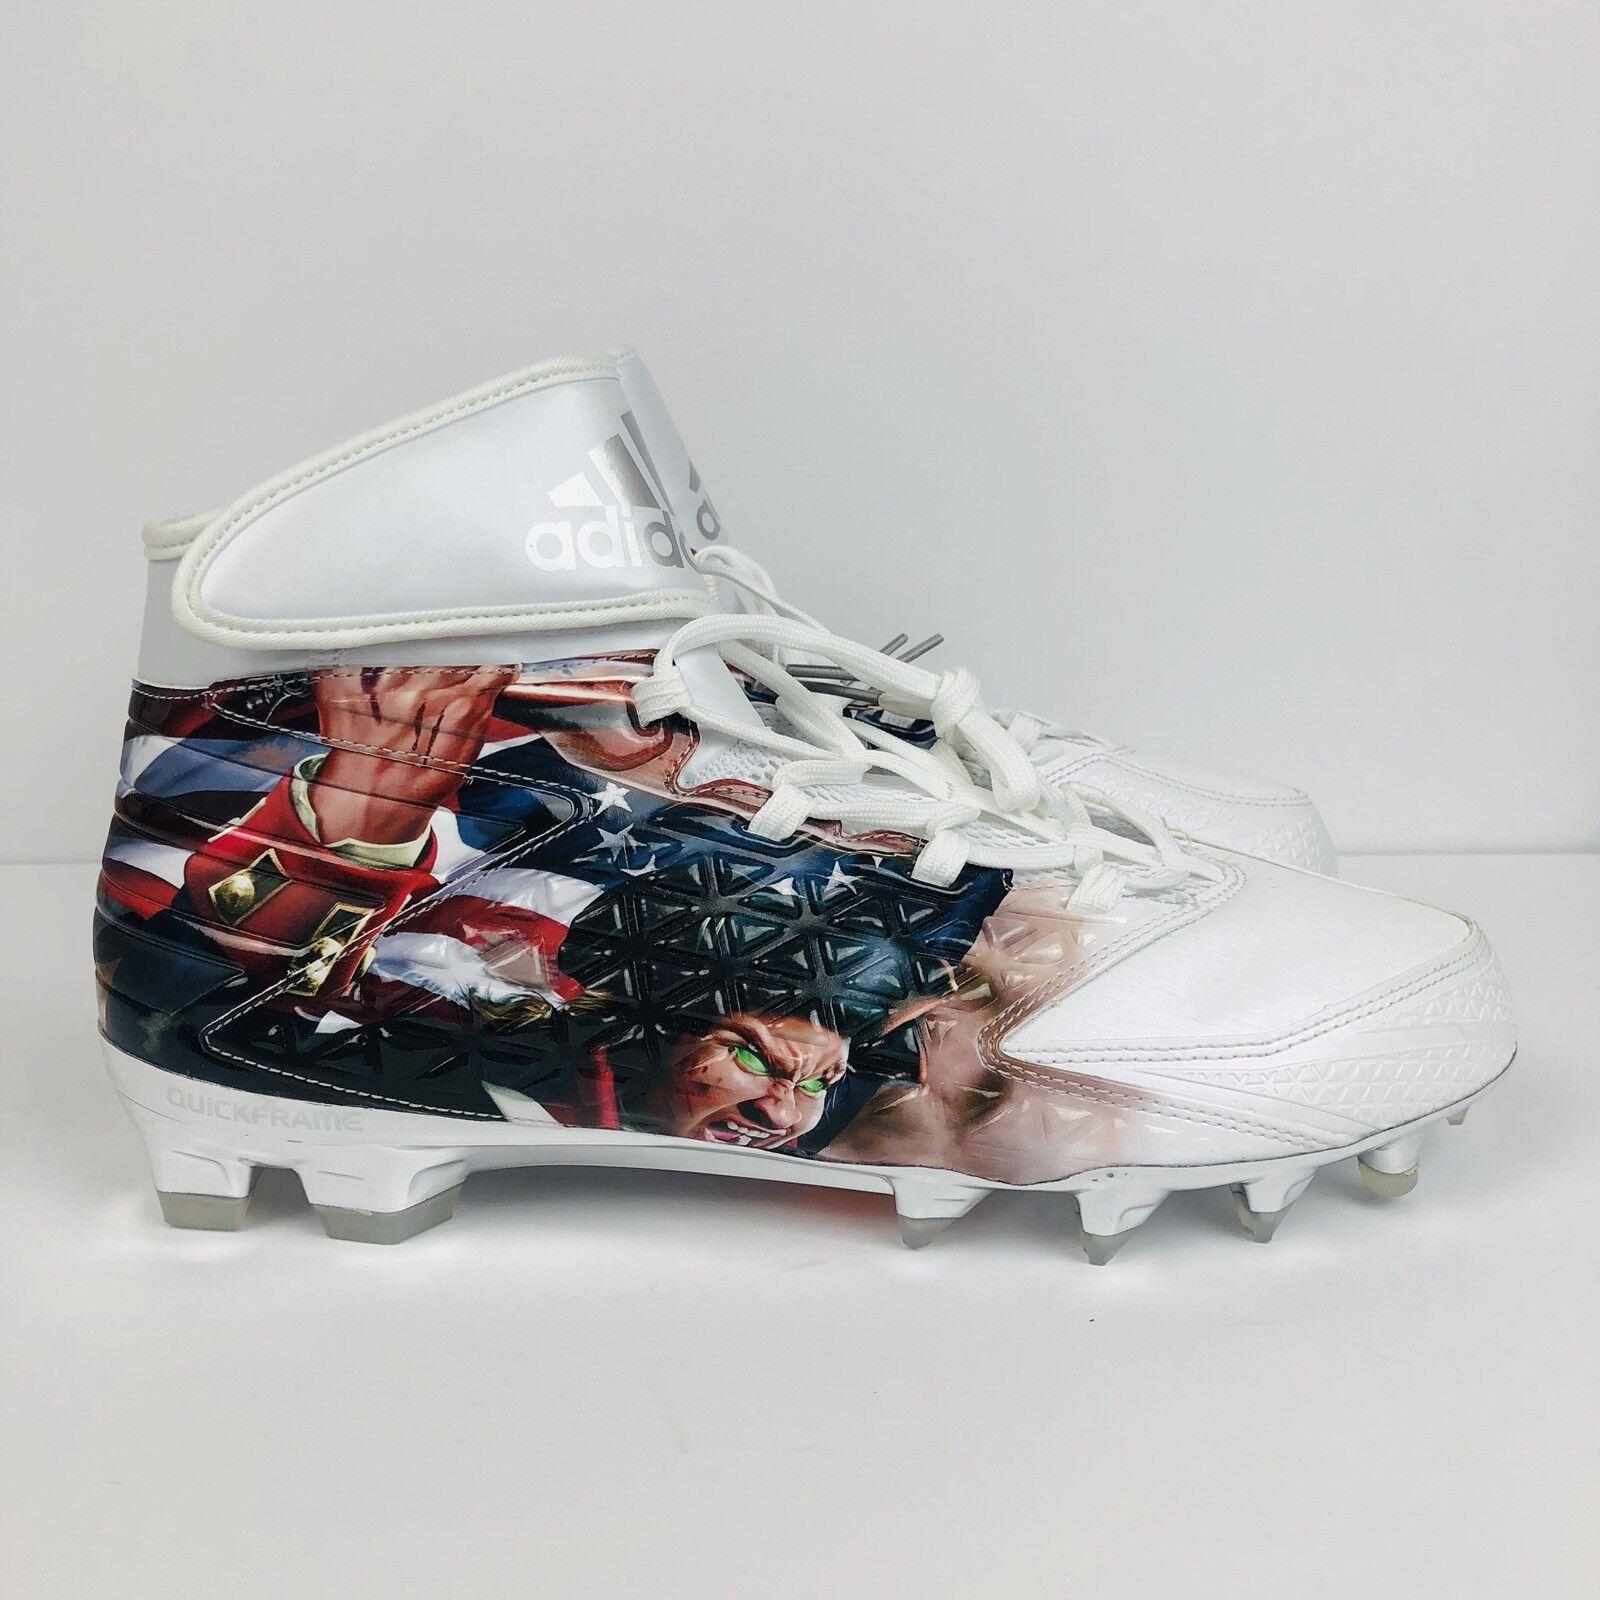 c2366006c Adidas Freak X Carbon High Uncaged Patriot Football Cleats White SZ AQ7826